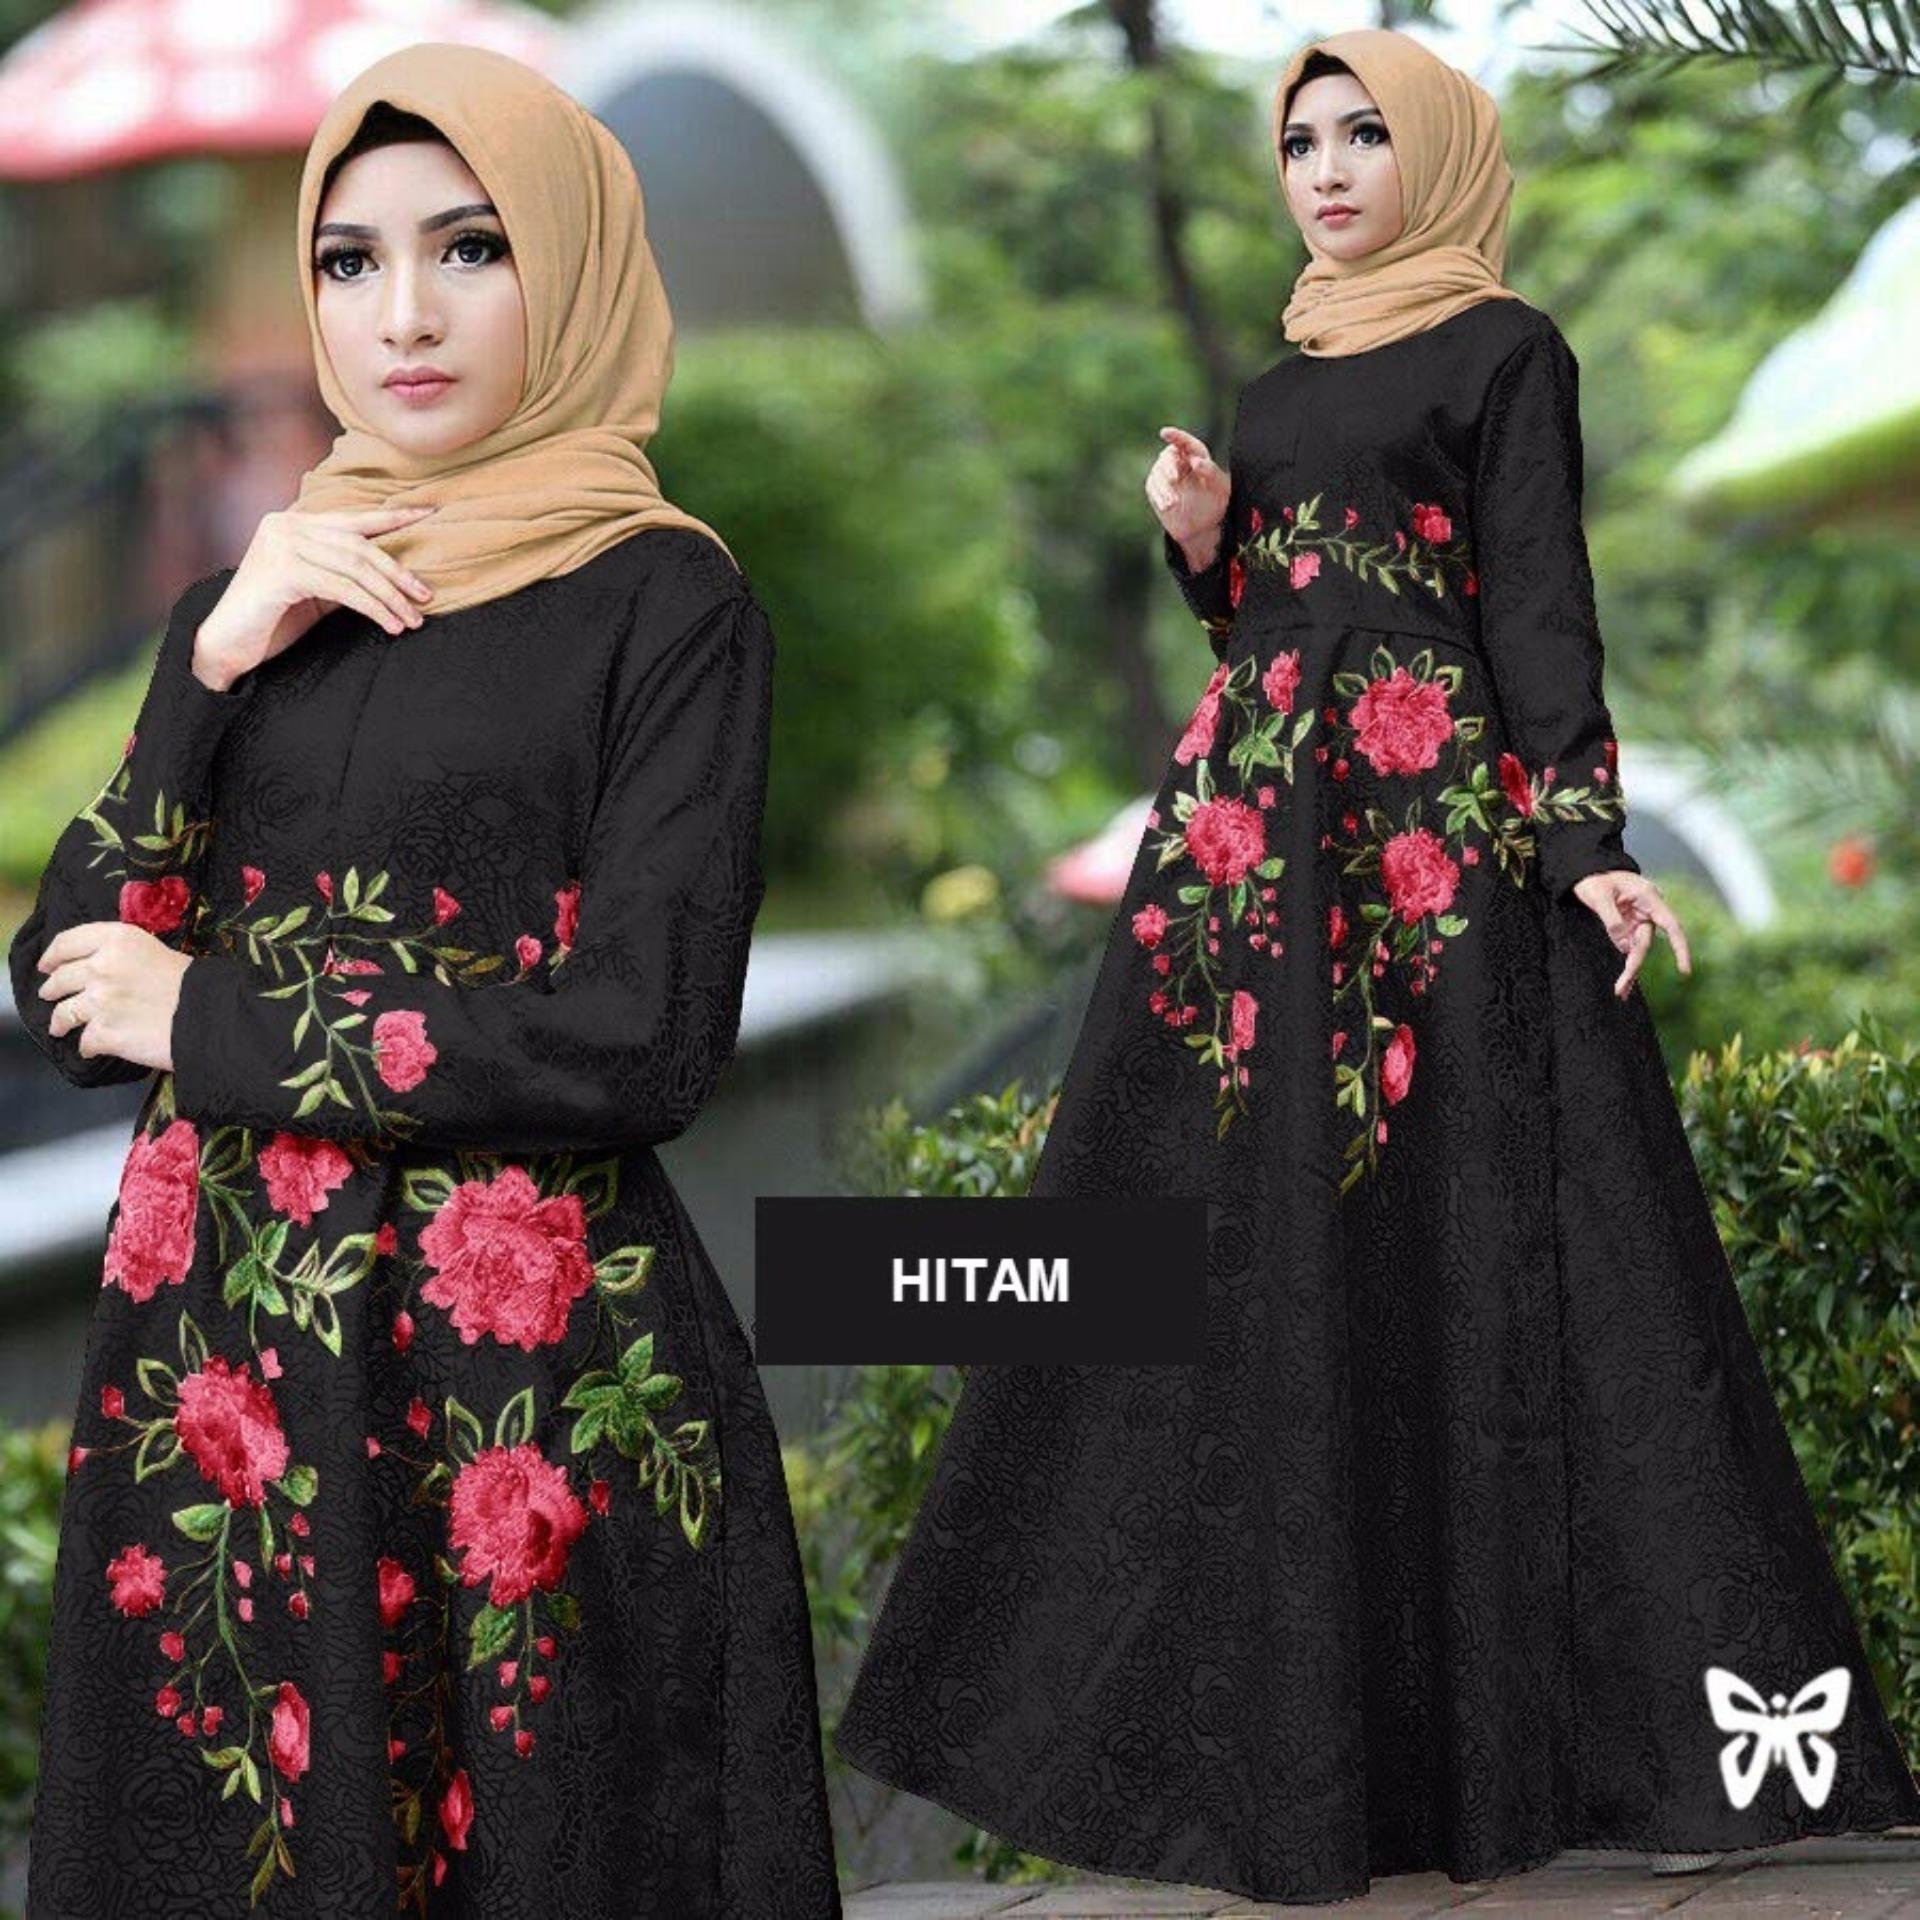 Sera Outfit Maxi Dress Lengan Panjang Bordir Bunga MSR001 / Gamis Syari / Gaun Pesta Muslimah / Baju Muslim Wanita Syar'i / Srayana